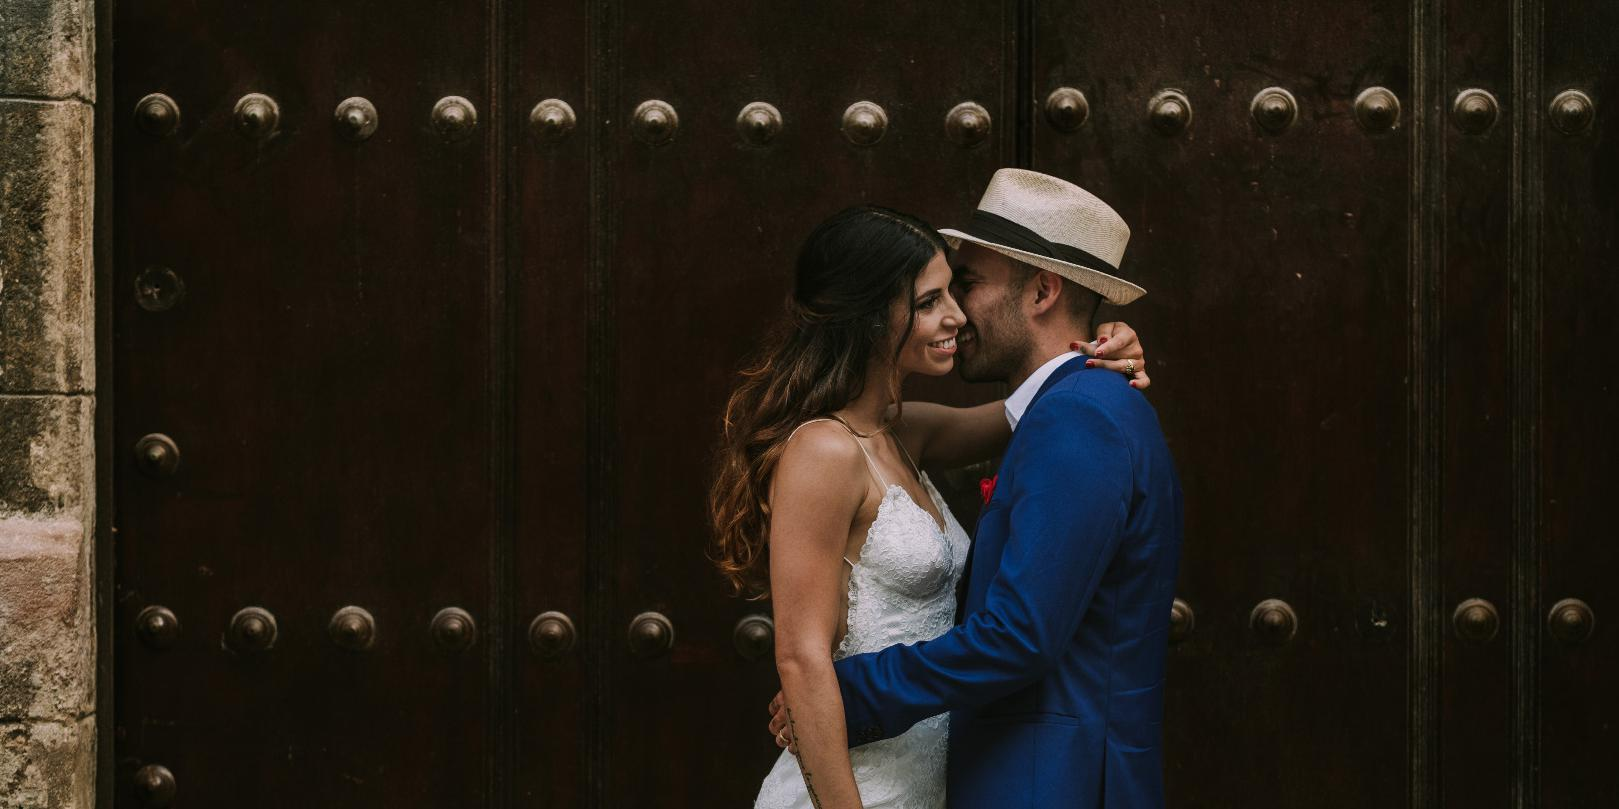 bodas-sin-clasificar-sin-tema-cuba-29021.jpg